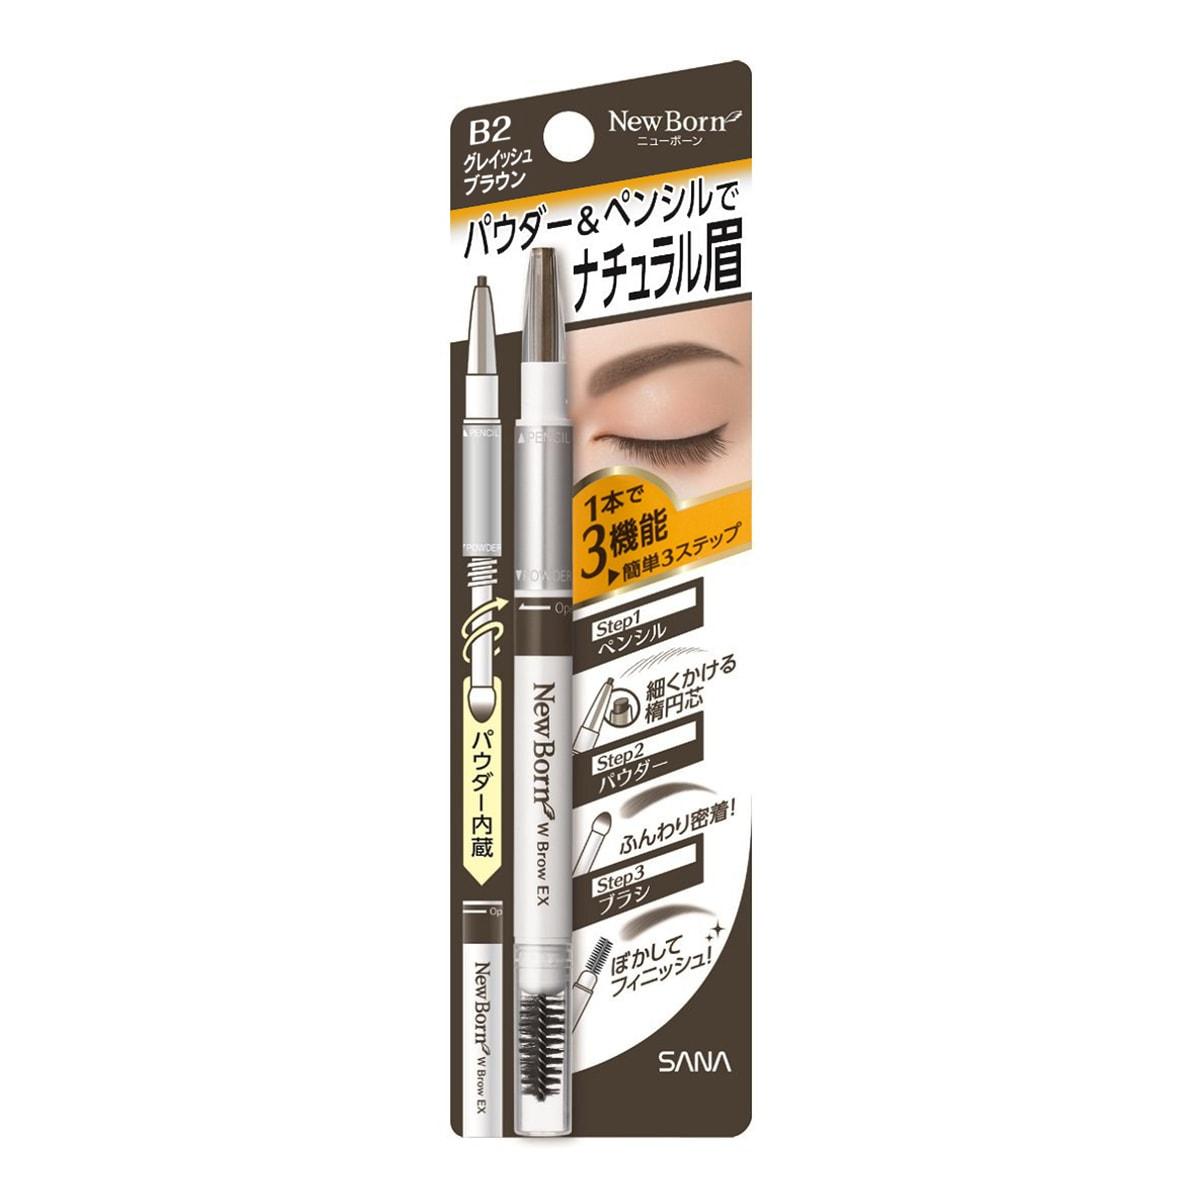 Yamibuy.com:Customer reviews:SANA NEW BORN EX 3 in 1 Eyebrow Pencil & Eyebrow Powder #B2 Grayish Brown 1pc